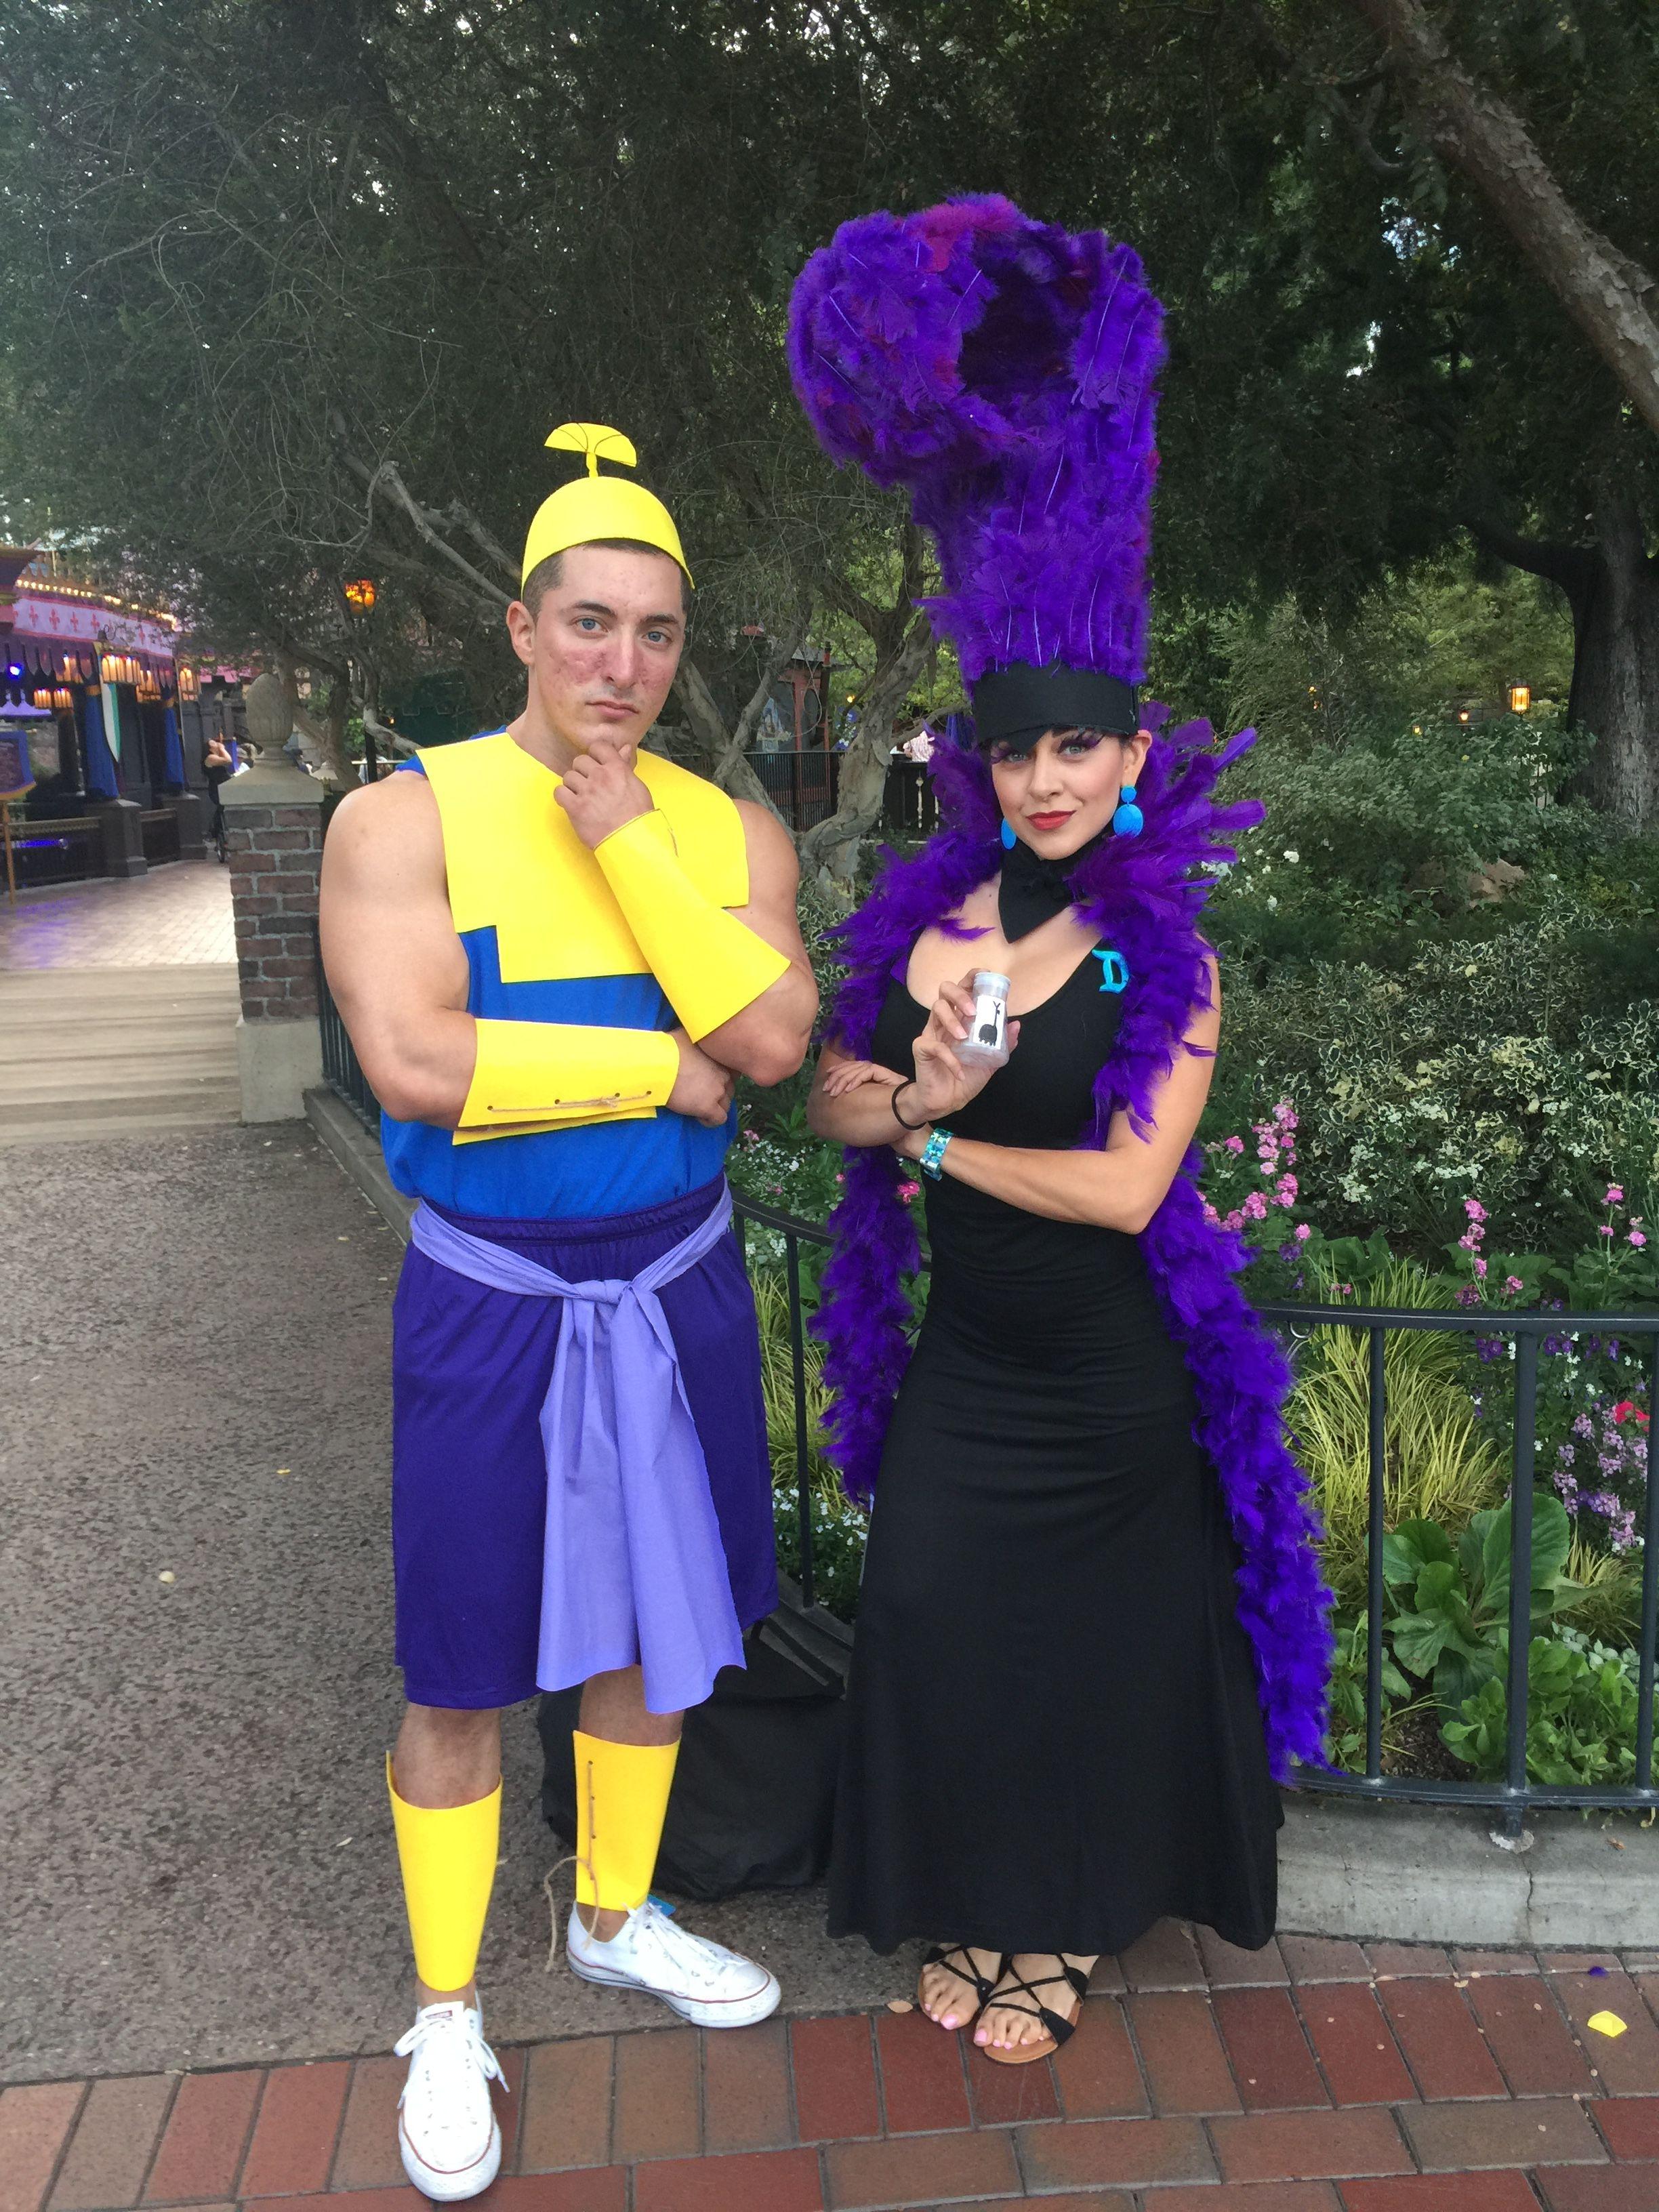 Kronk costume